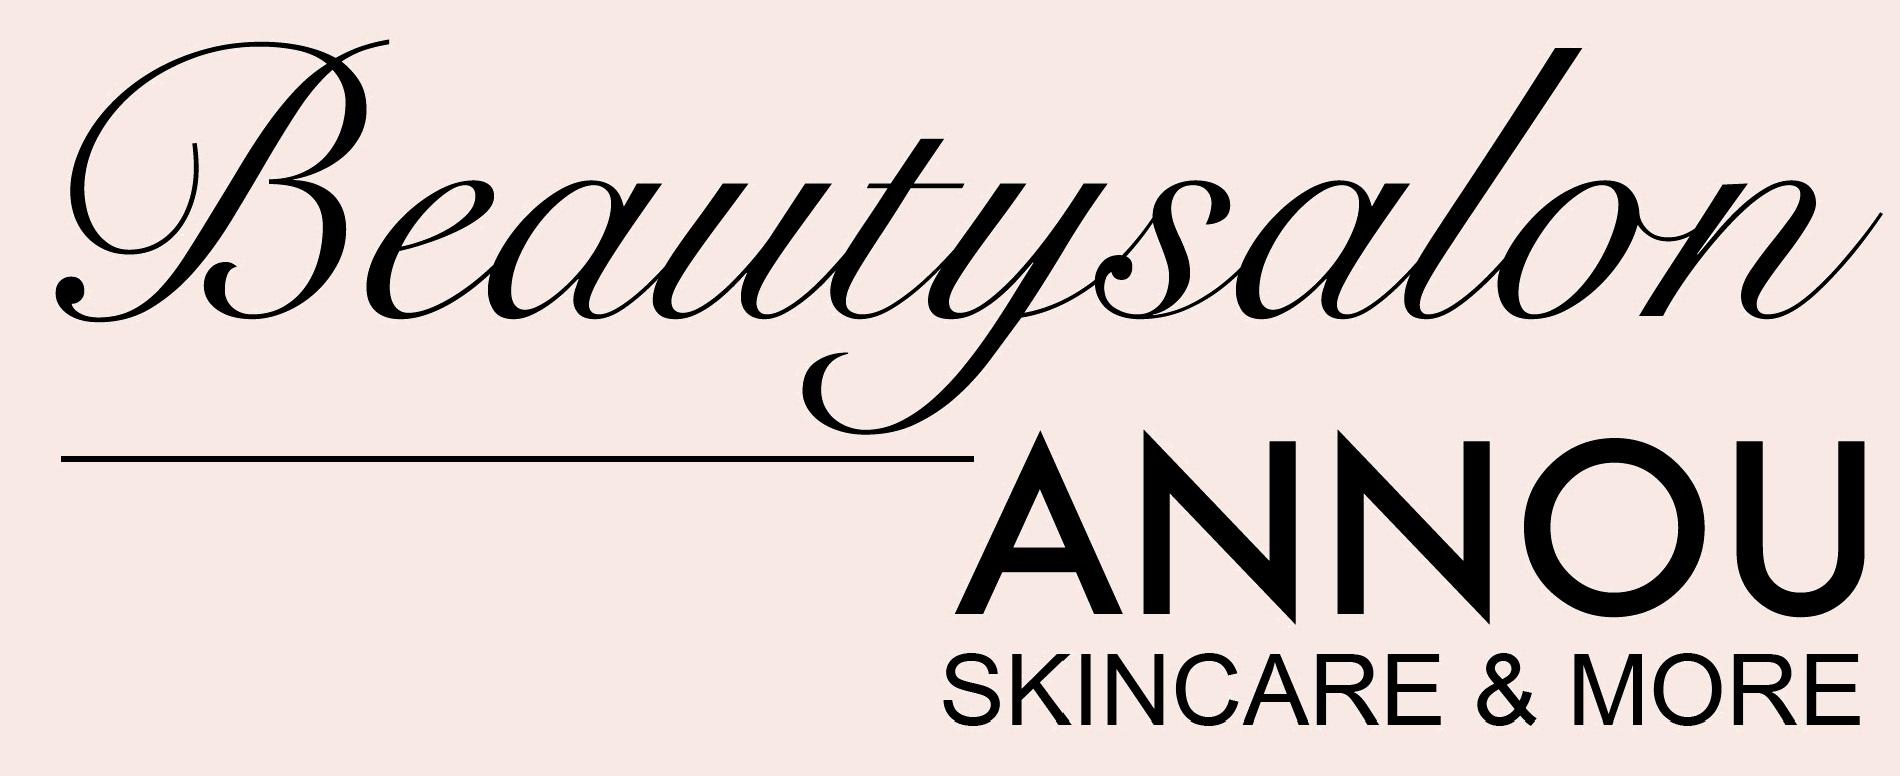 Beautysalon Annou